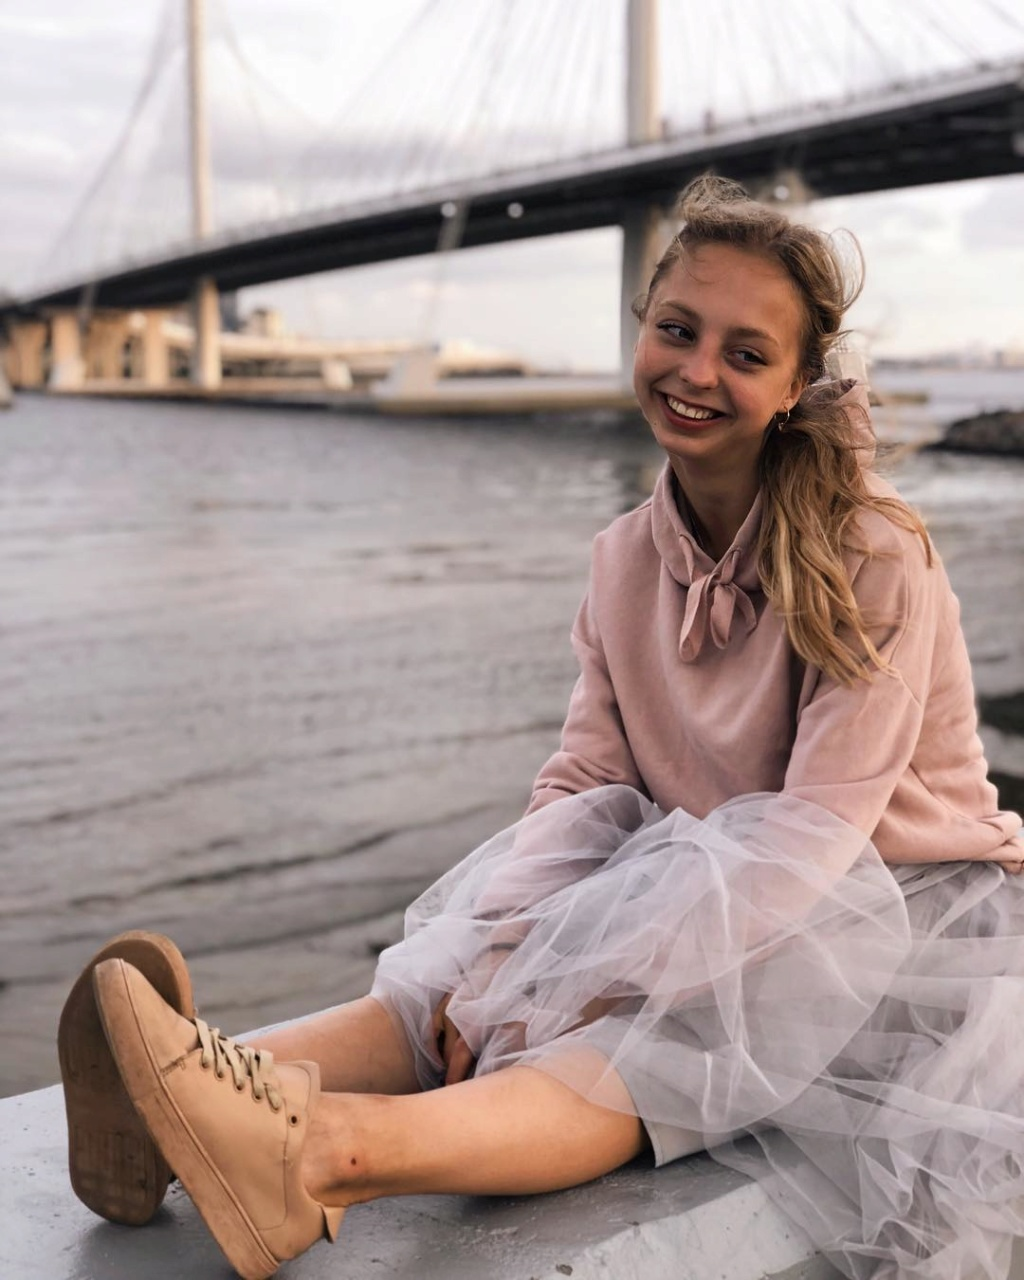 Александра Бойкова-Дмитрий Козловский - Страница 12 111110